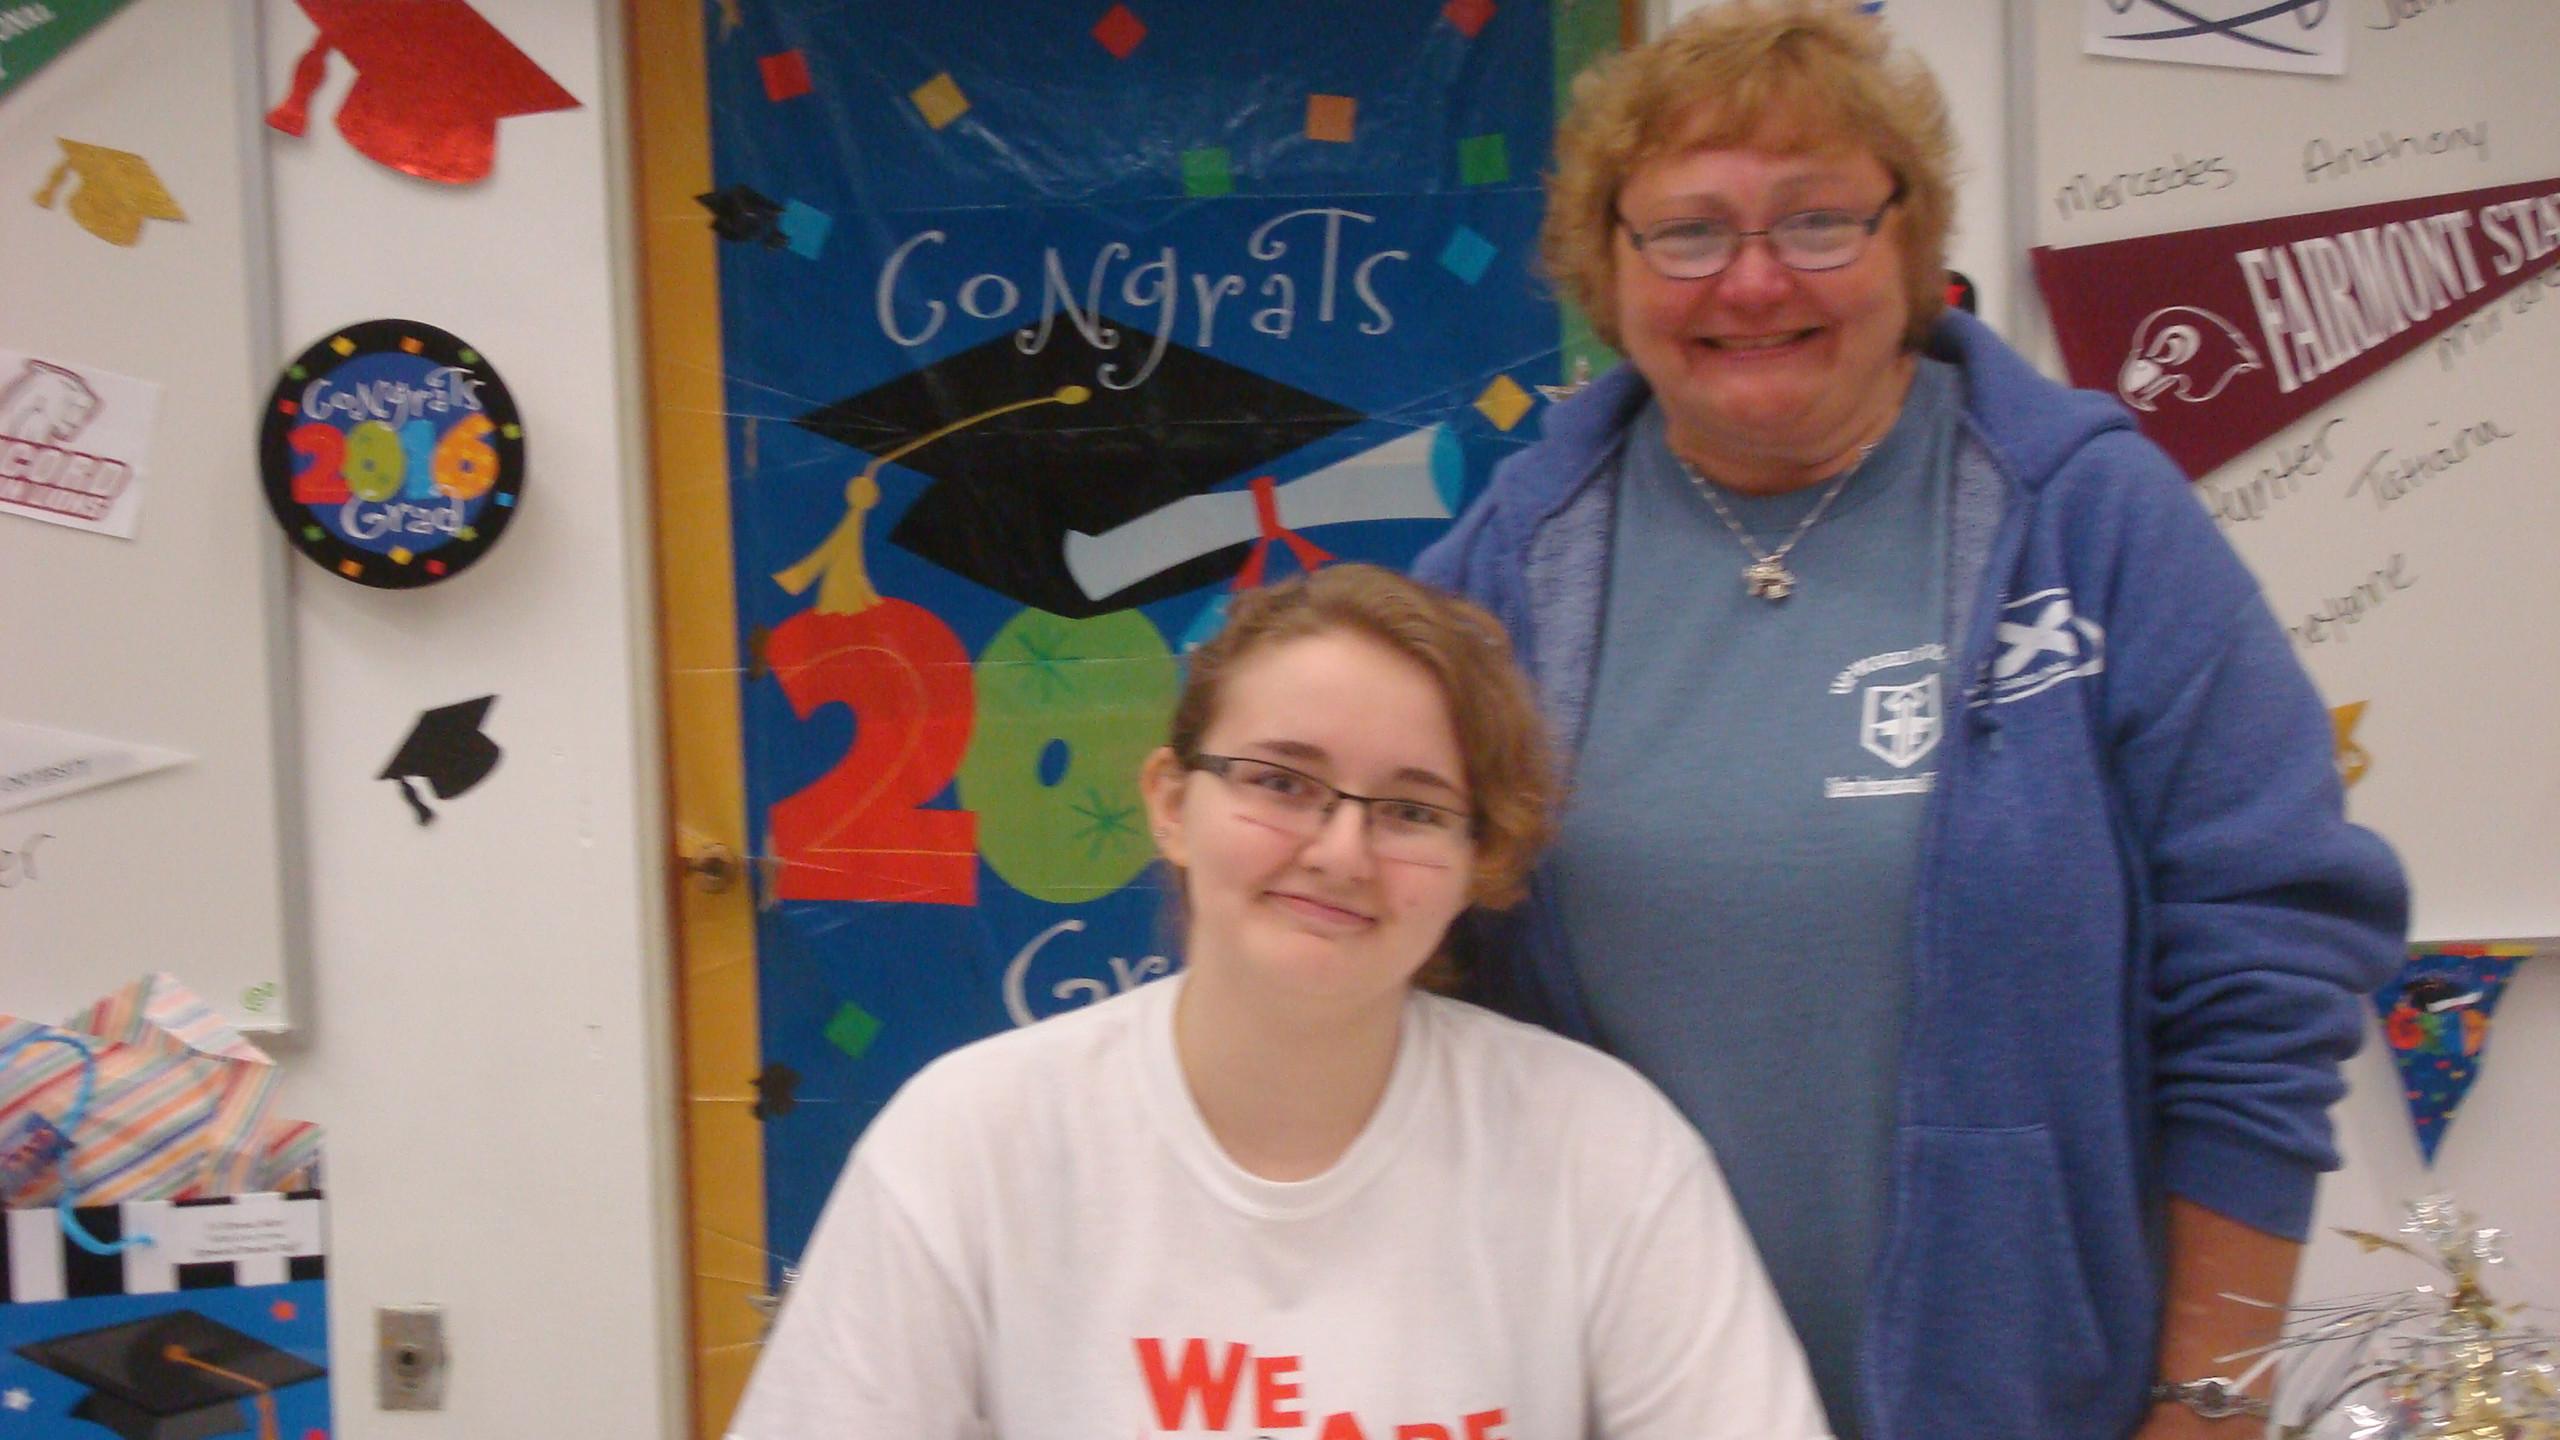 Teresa will be attending Davis & Elkins College